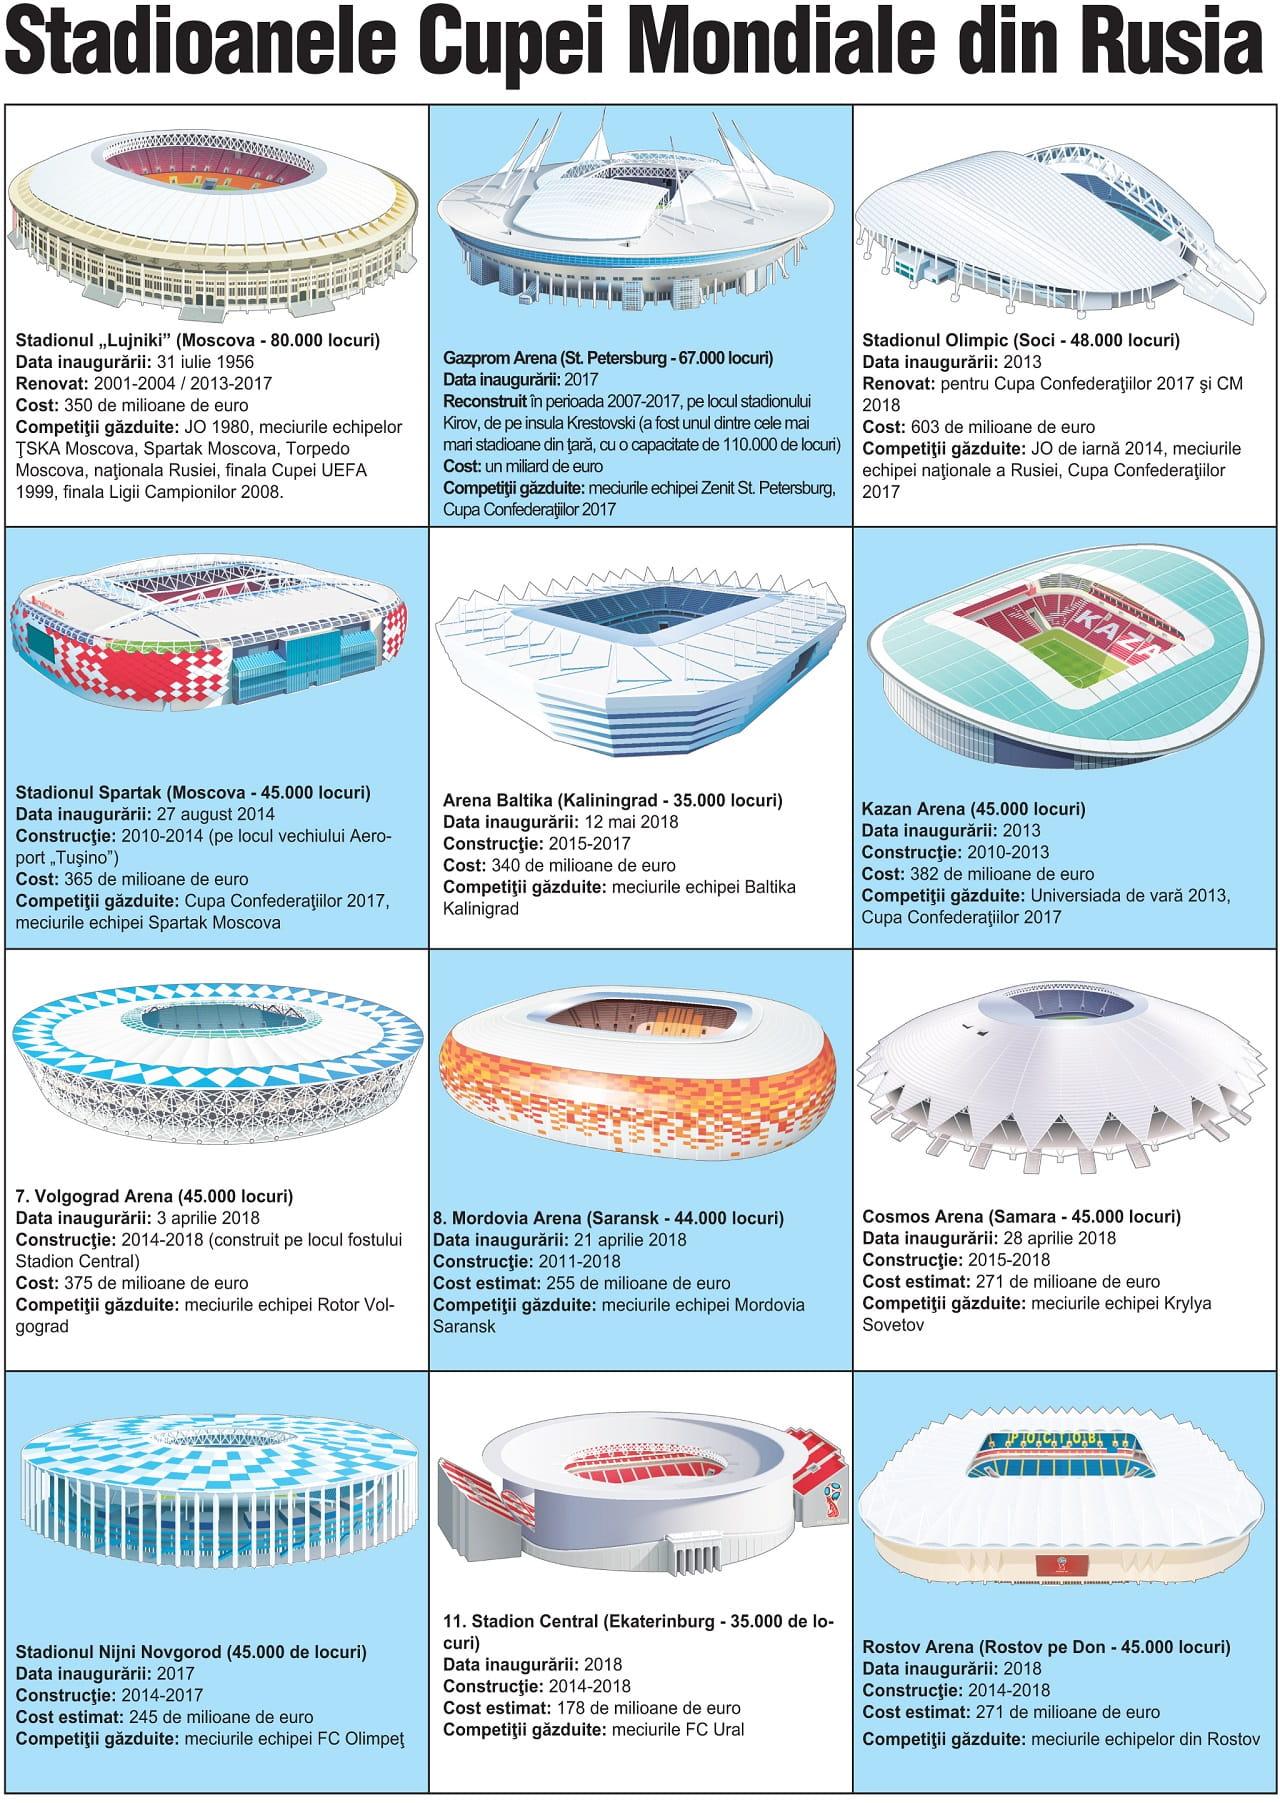 Stadioanele Cupei Mondiale din Rusia